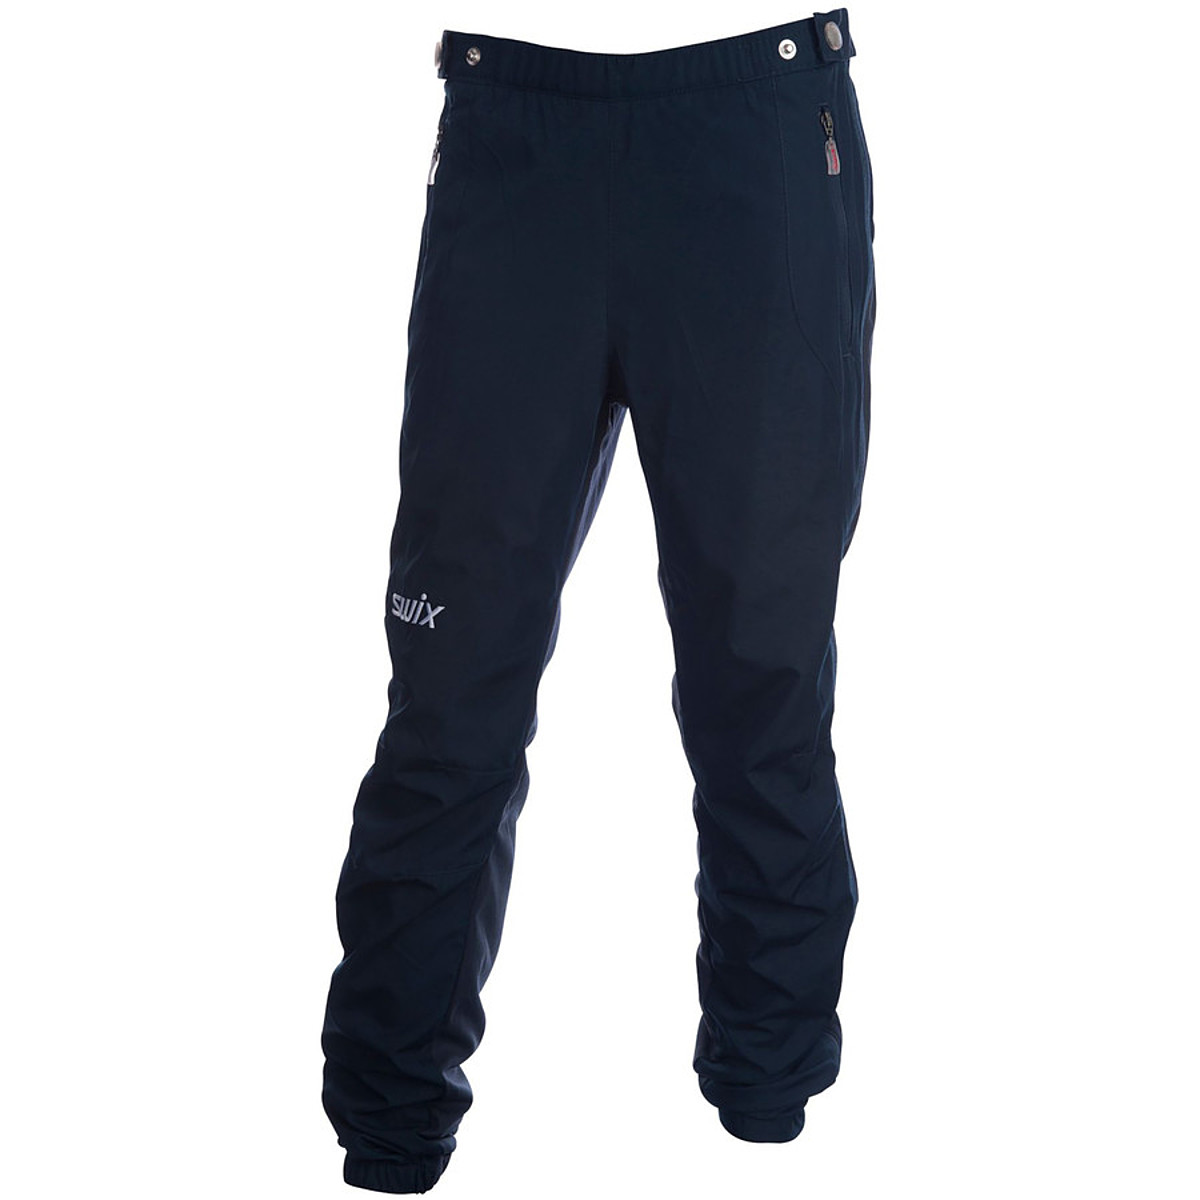 Swix Universal Pant